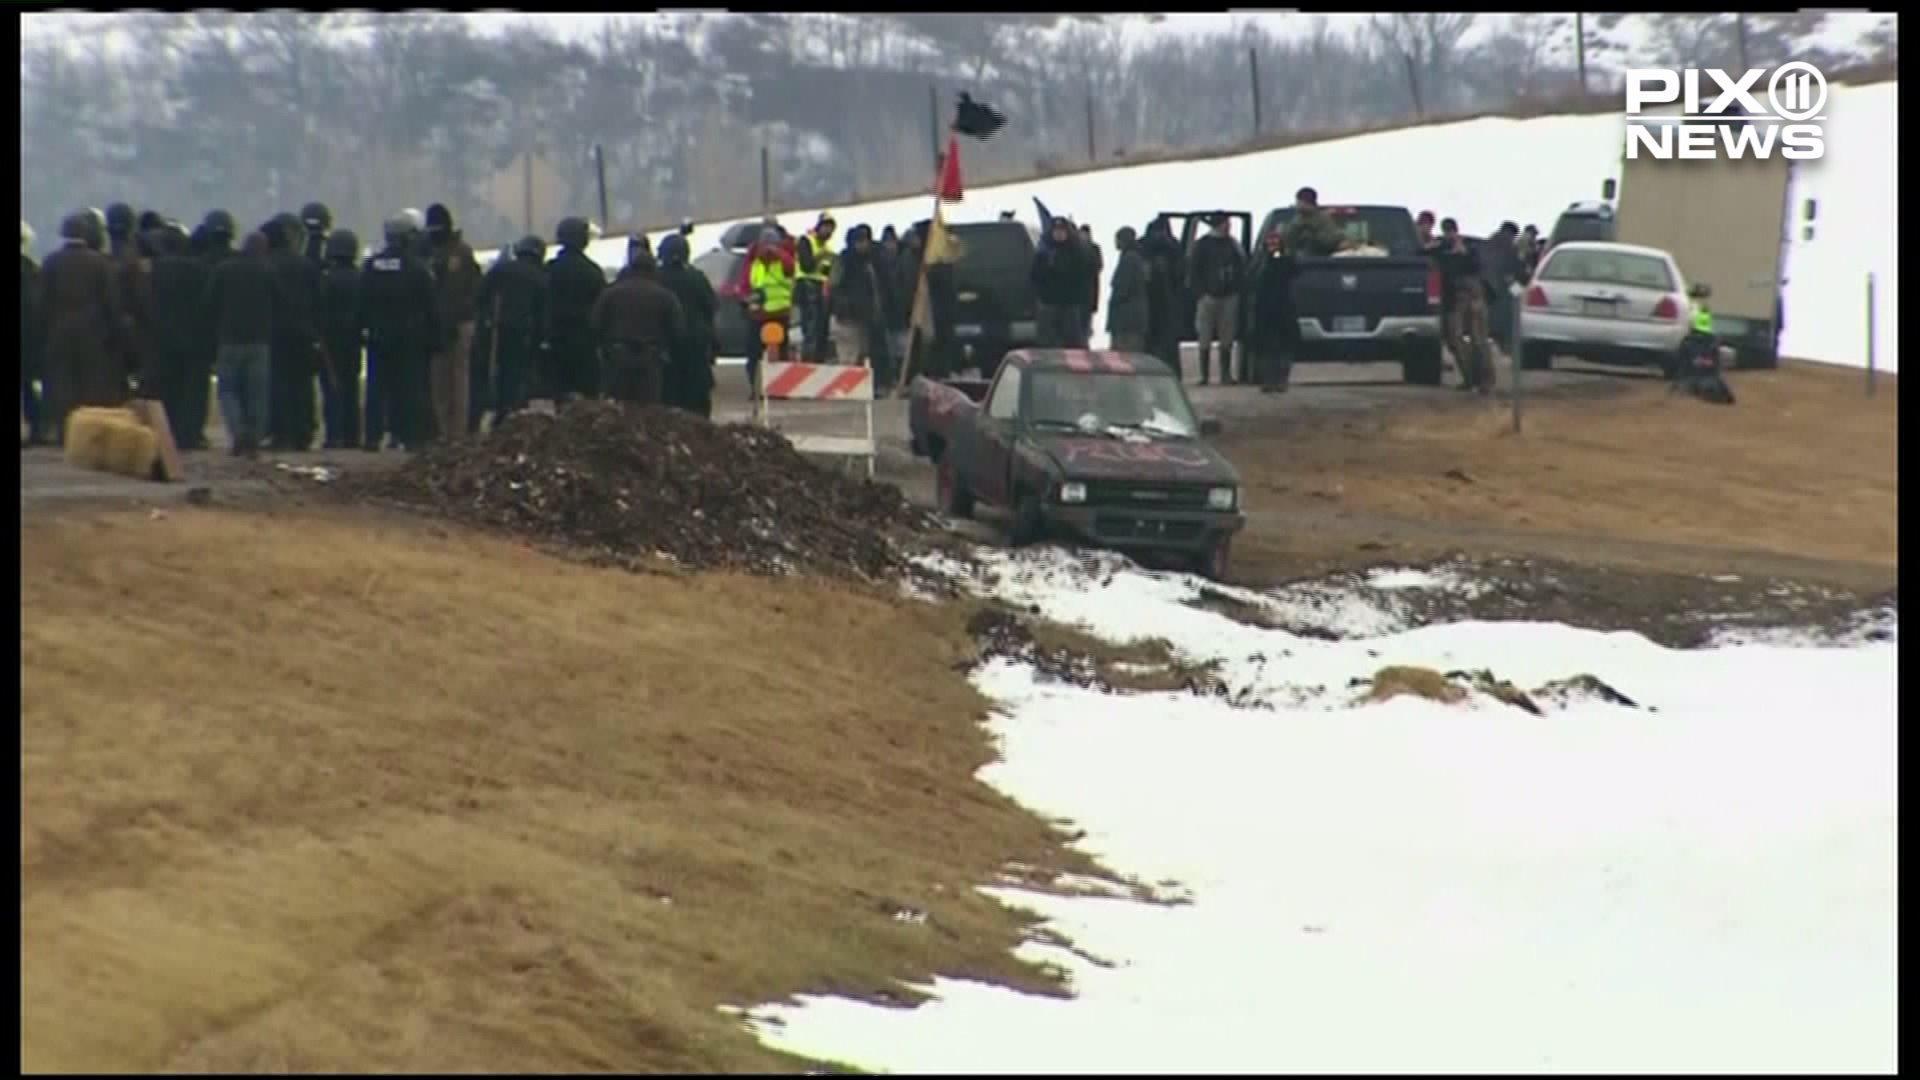 Police Begin Arresting Dakota Access Pipeline Protesters at North Dakota Camp